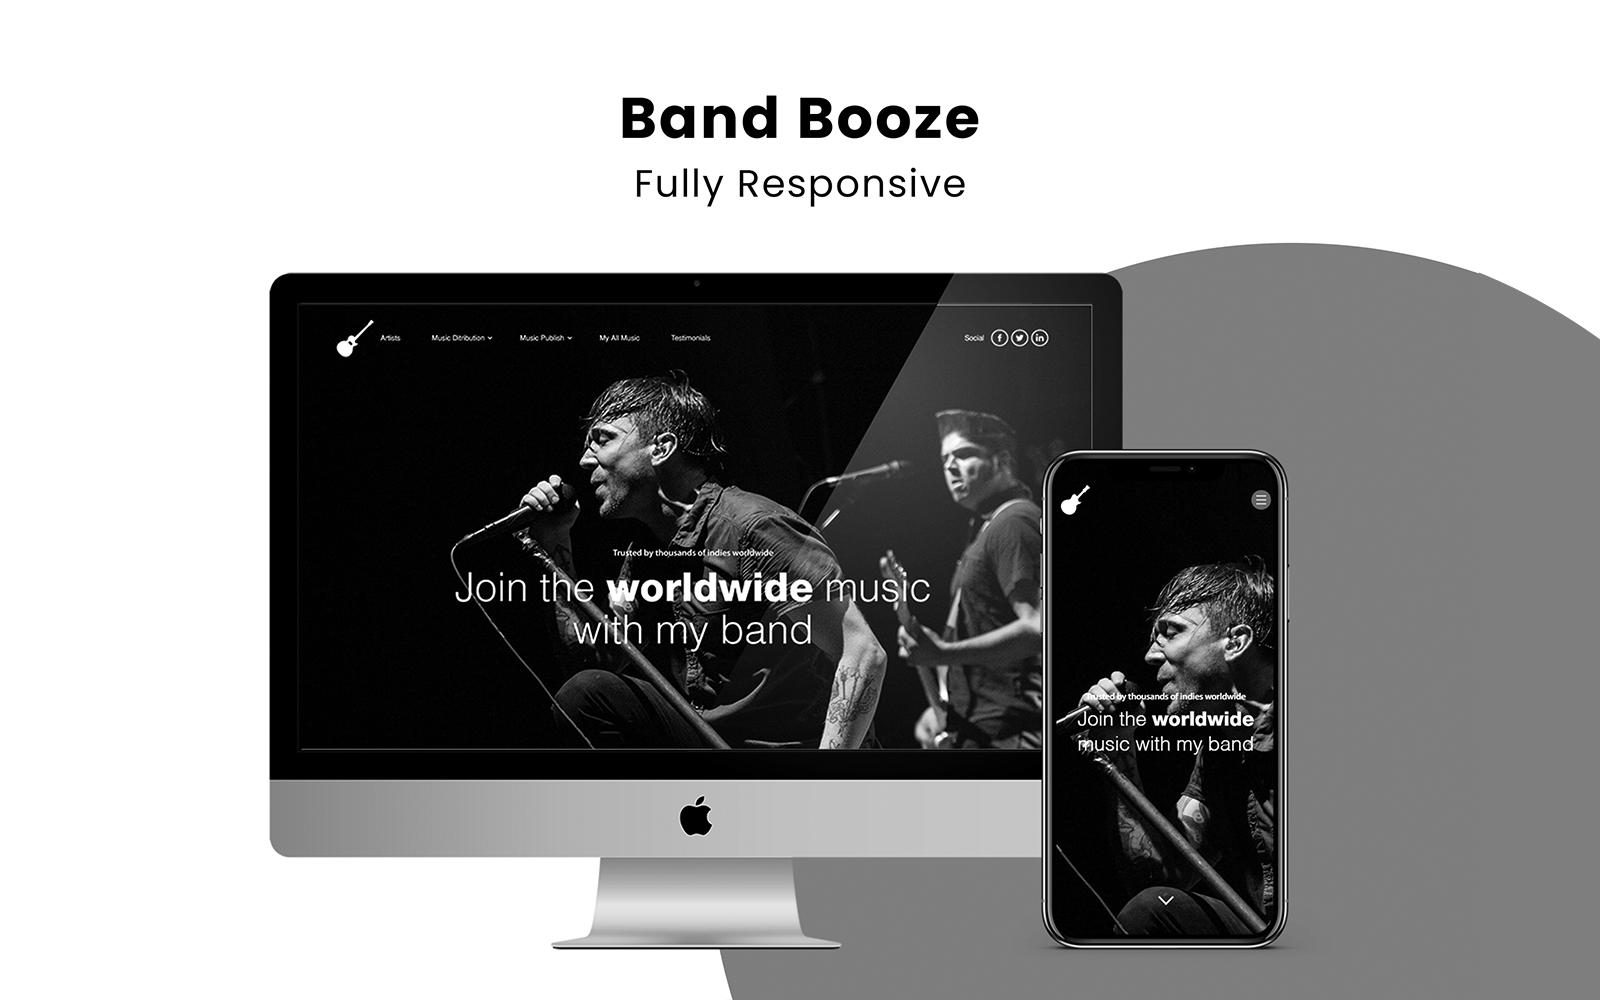 Band Booze - Responsive Portfolio Landing Page Template